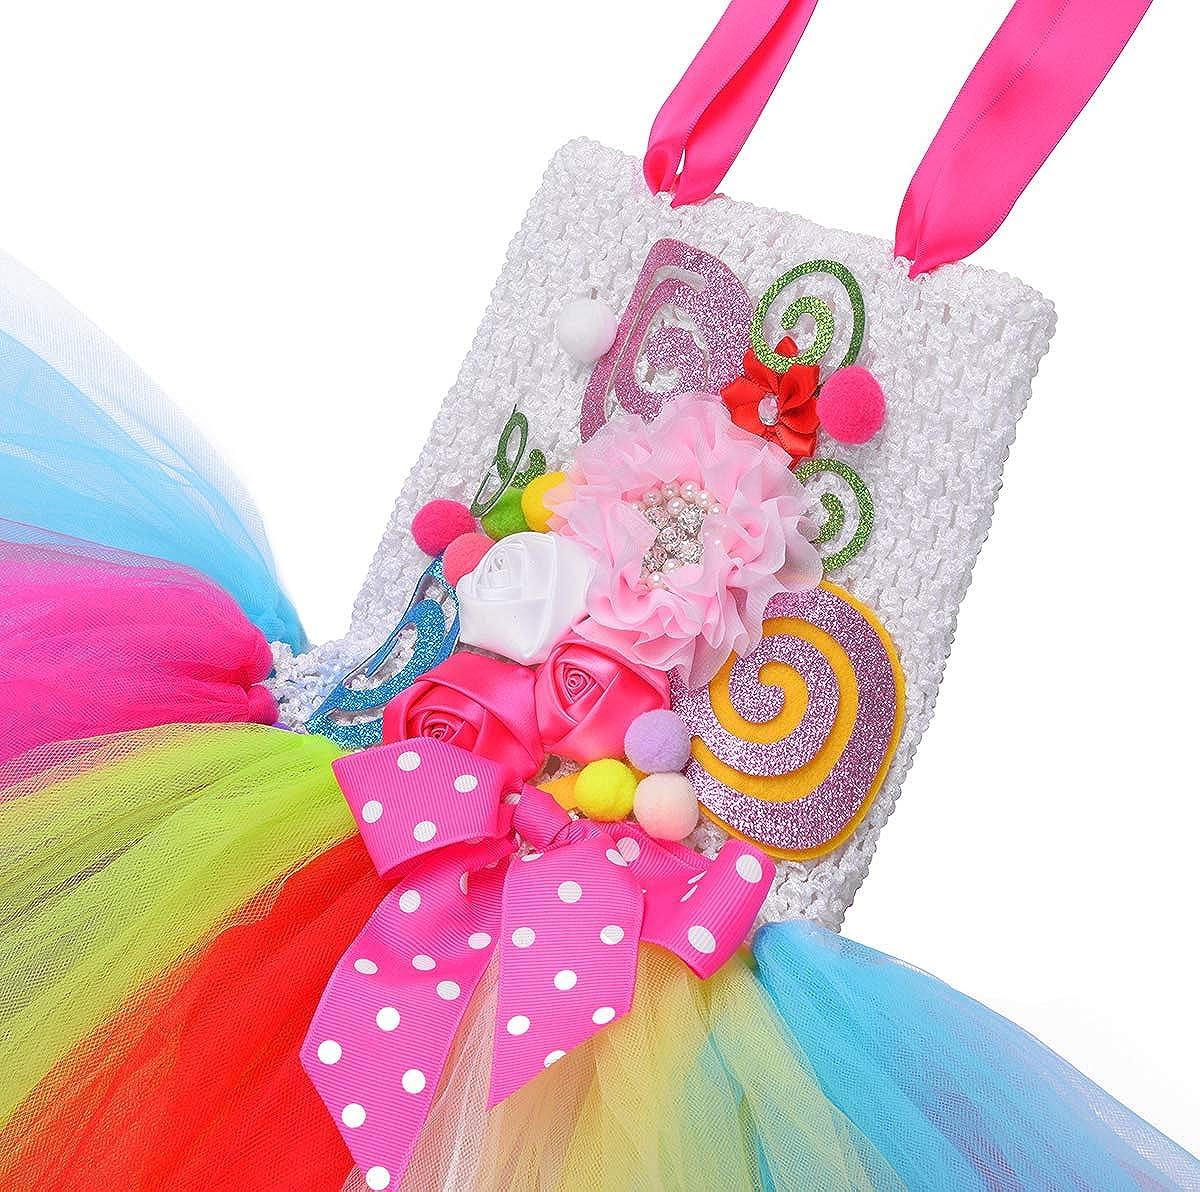 Tutu Dreams Rainbow Candy Costume for Girls with Lollipop Headband Birthday Gifts Tea Halloween Party